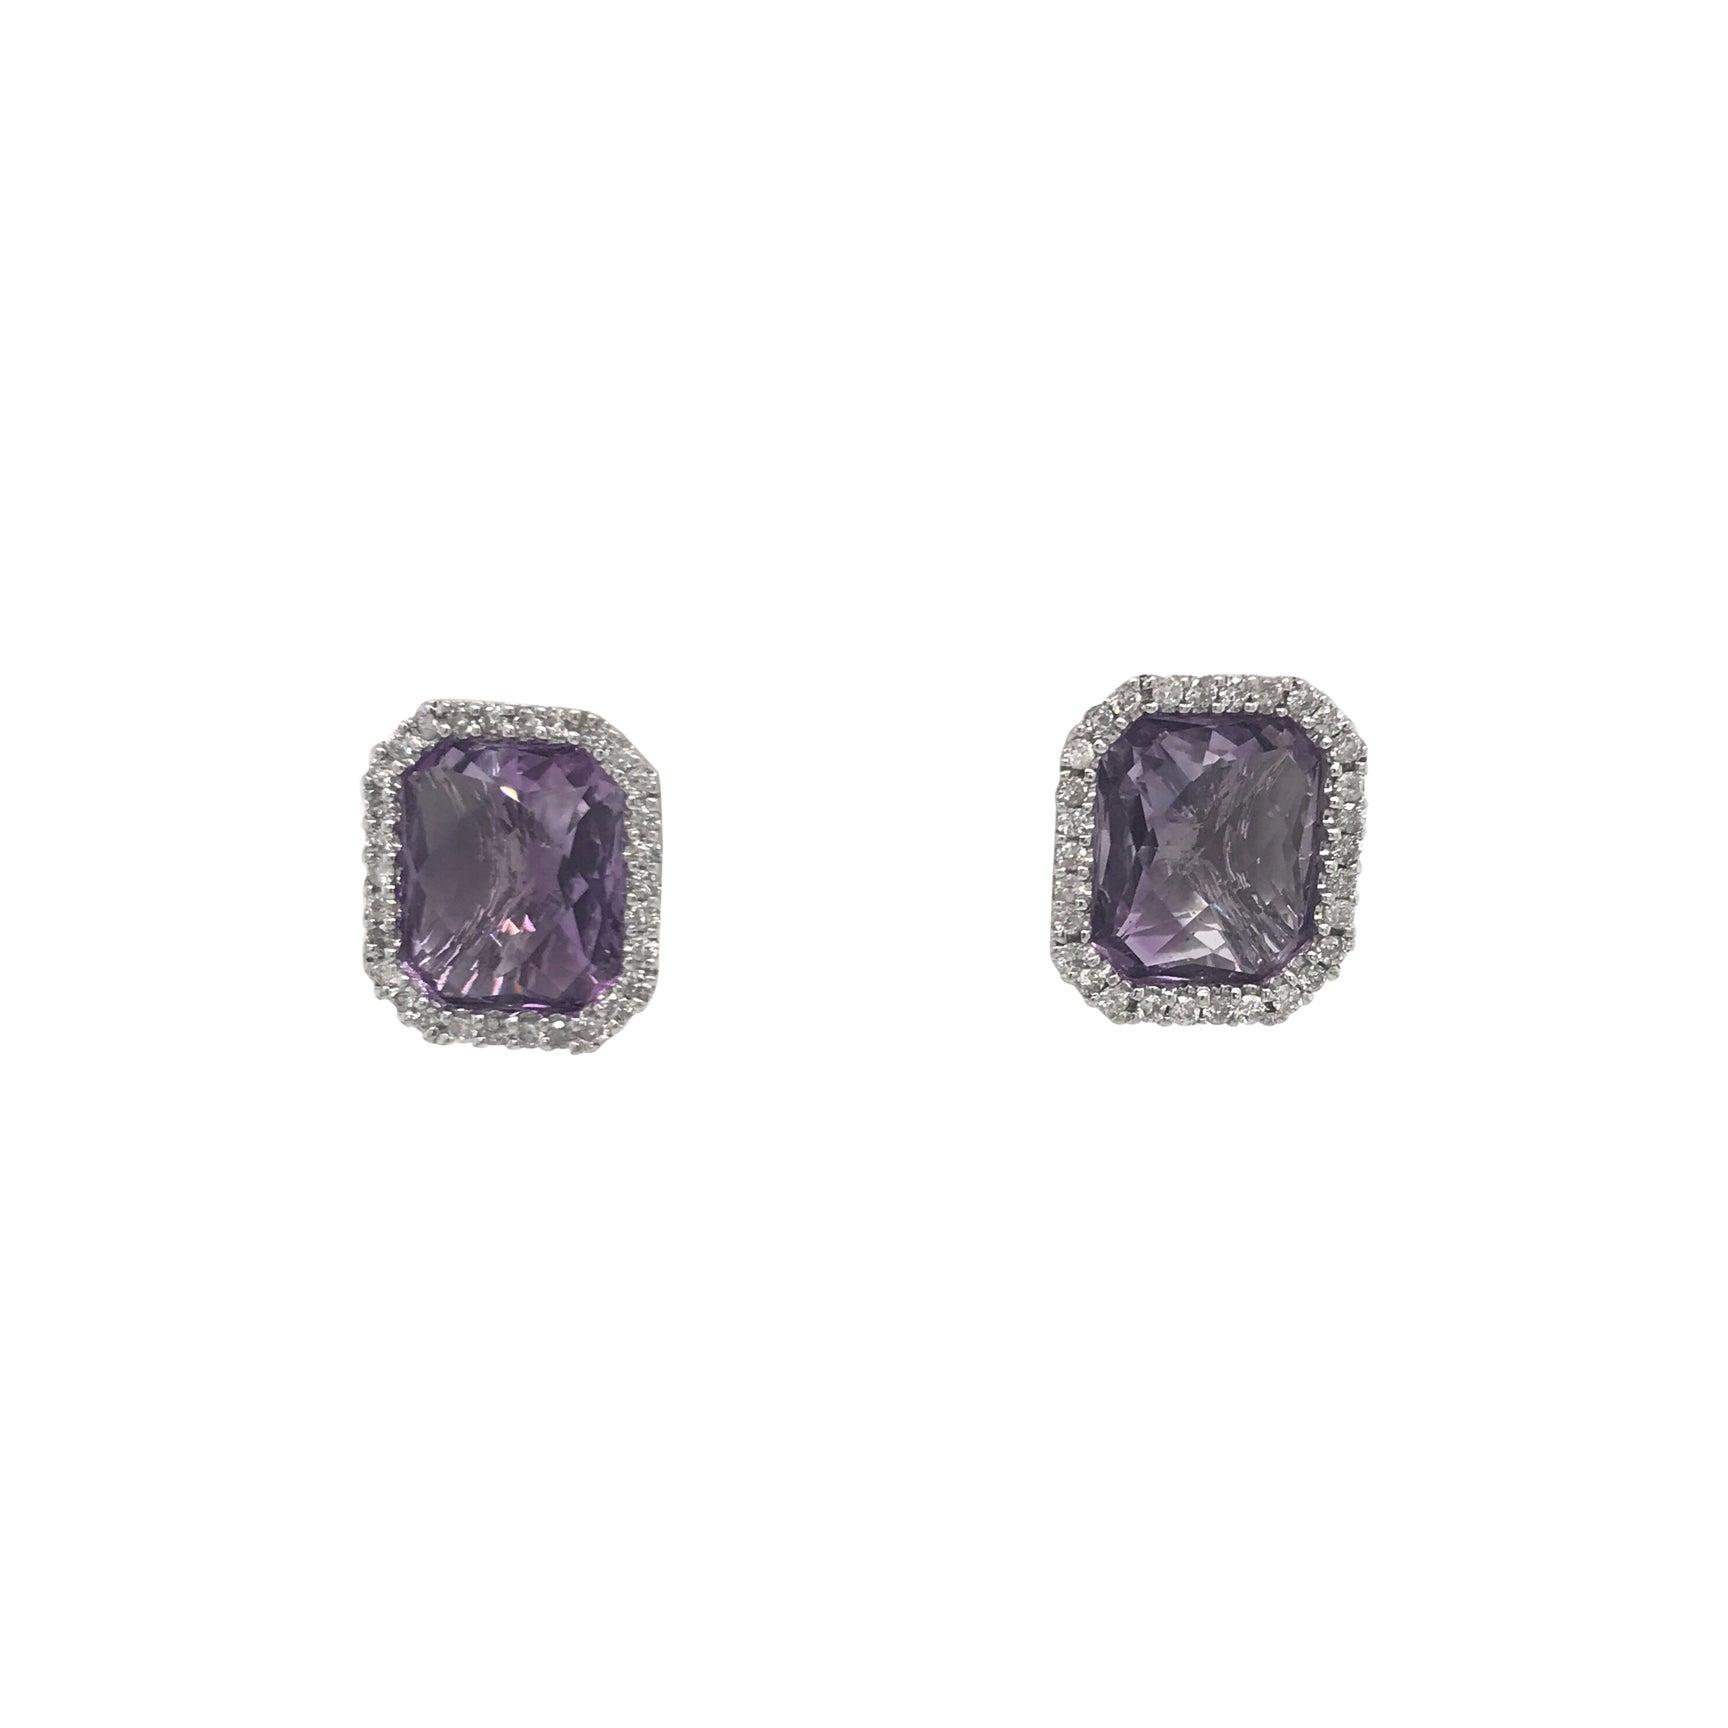 Amethyst Diamond Halo Stud Earrings 0.55 Carat 14 Karat White Gold